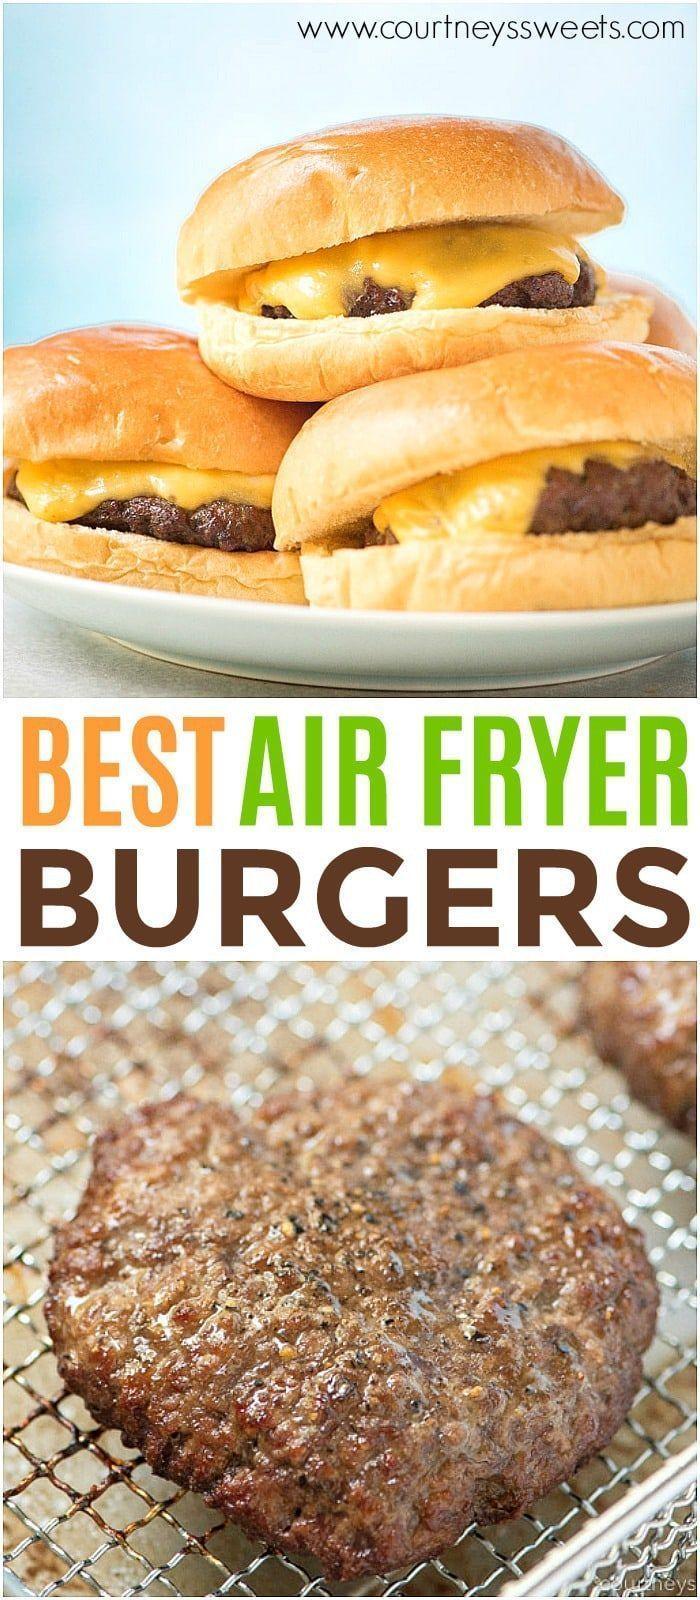 air fryer burgers recipe air fryer recipes air fryer